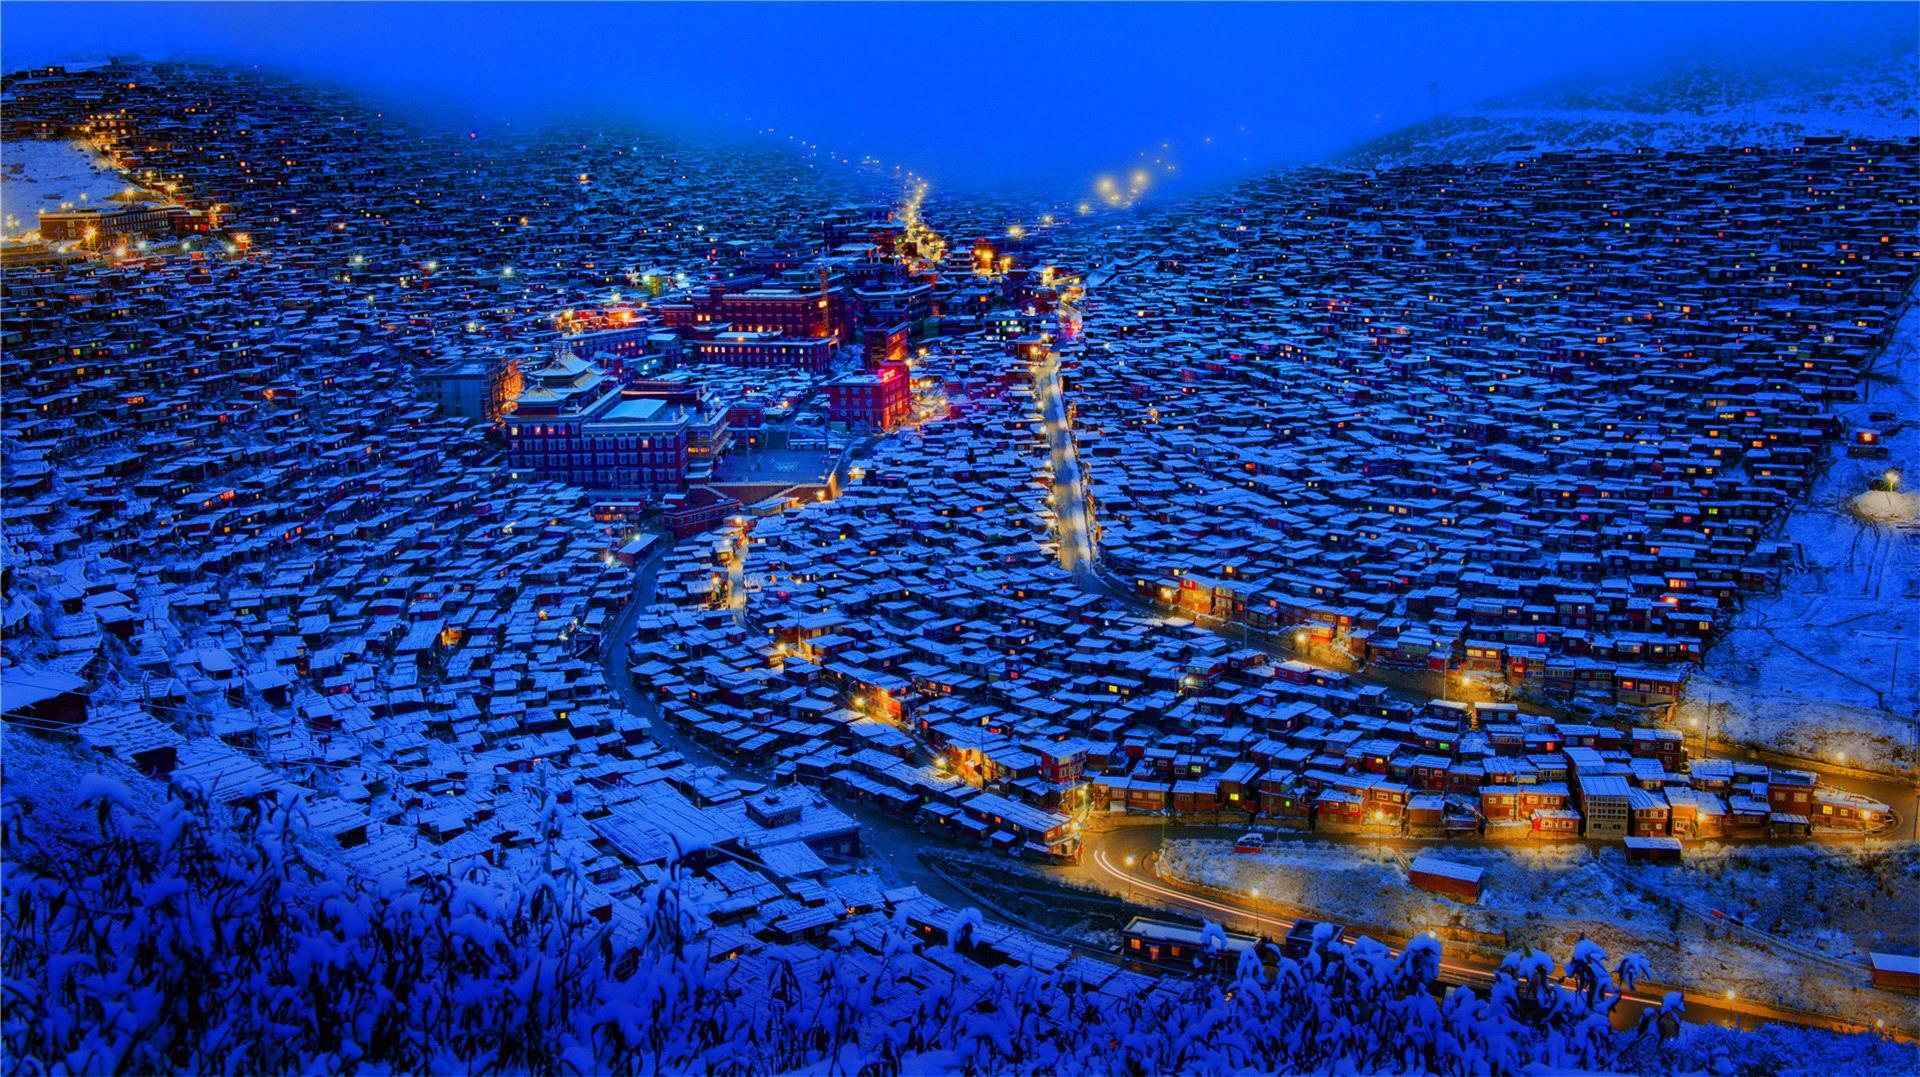 PSA HM Ribbons - Guoqun Wu (China)  The Blazing Nocturne